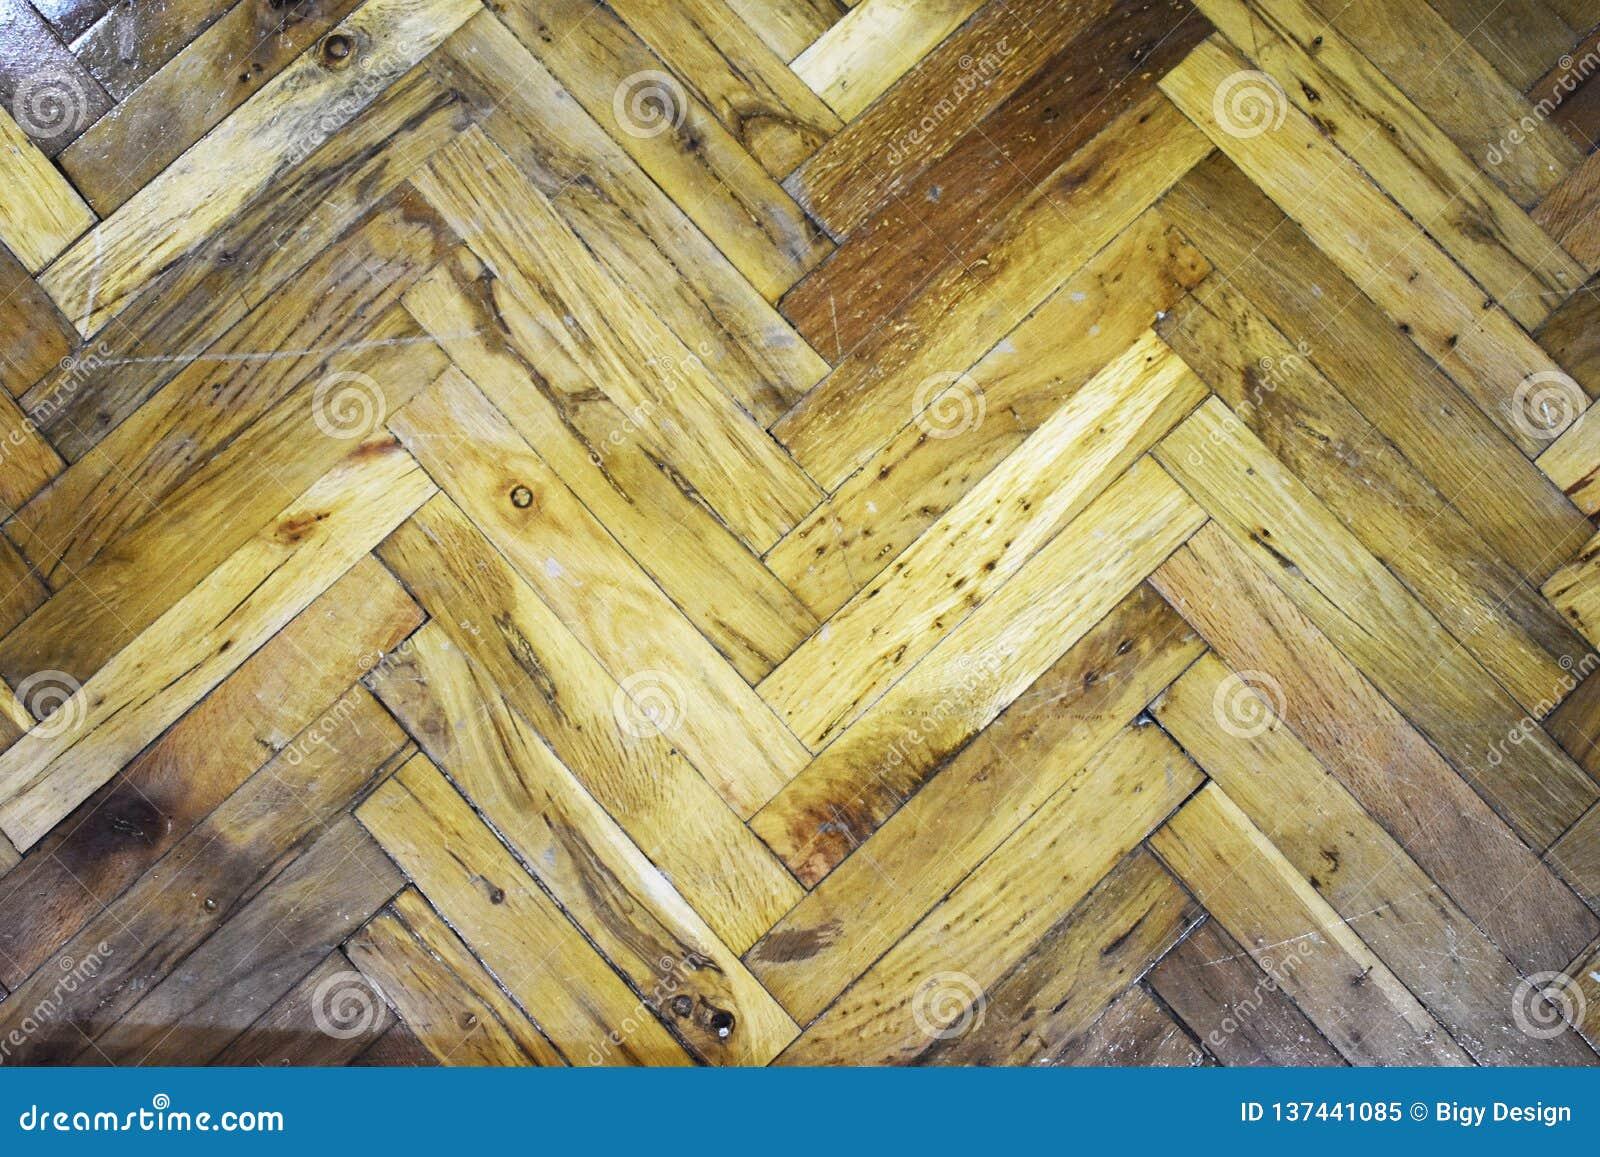 Hartholz mit geometrischem Muster